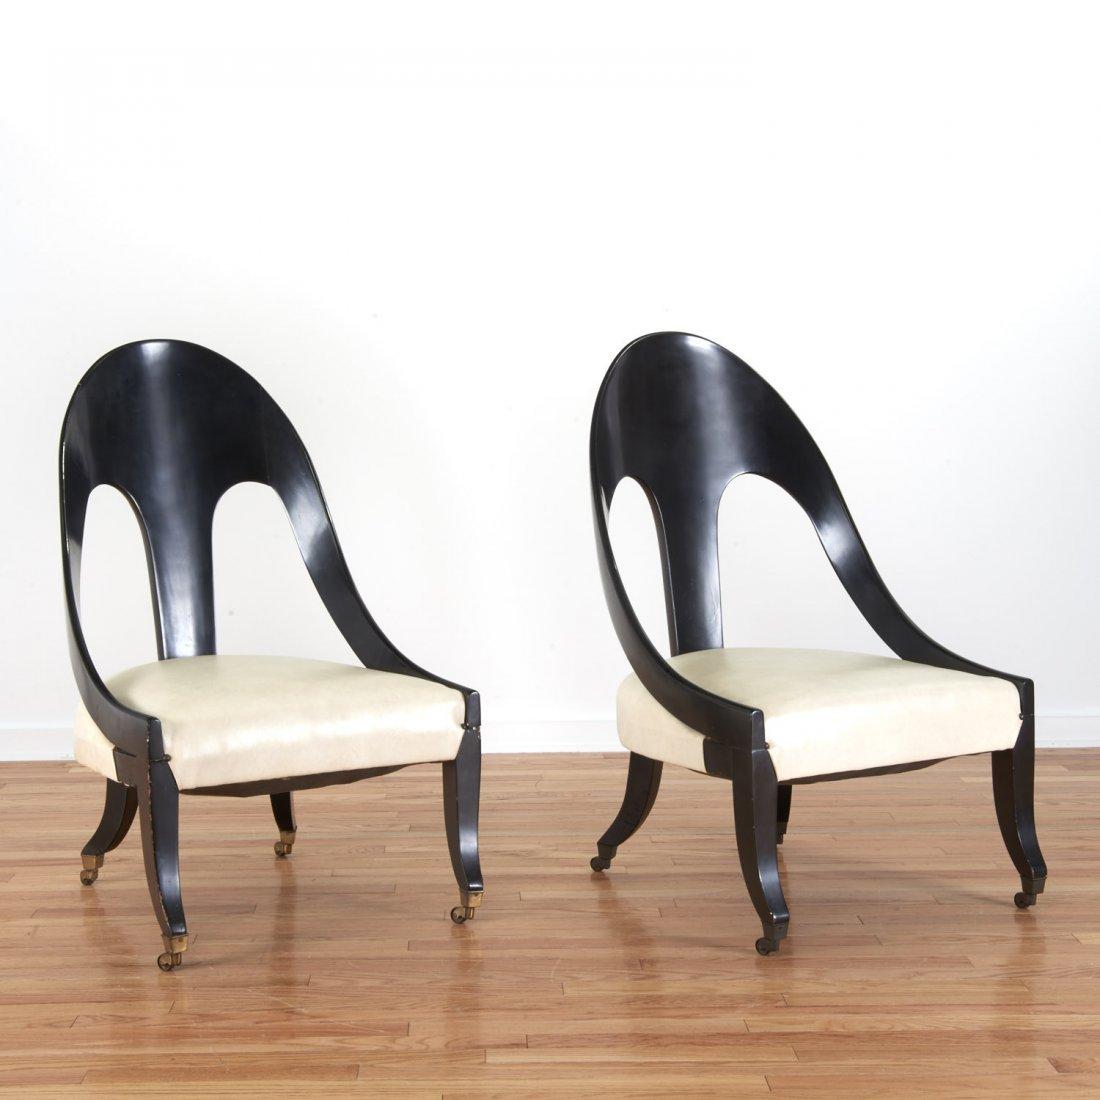 Pair Hollywood Regency spoon-back chairs